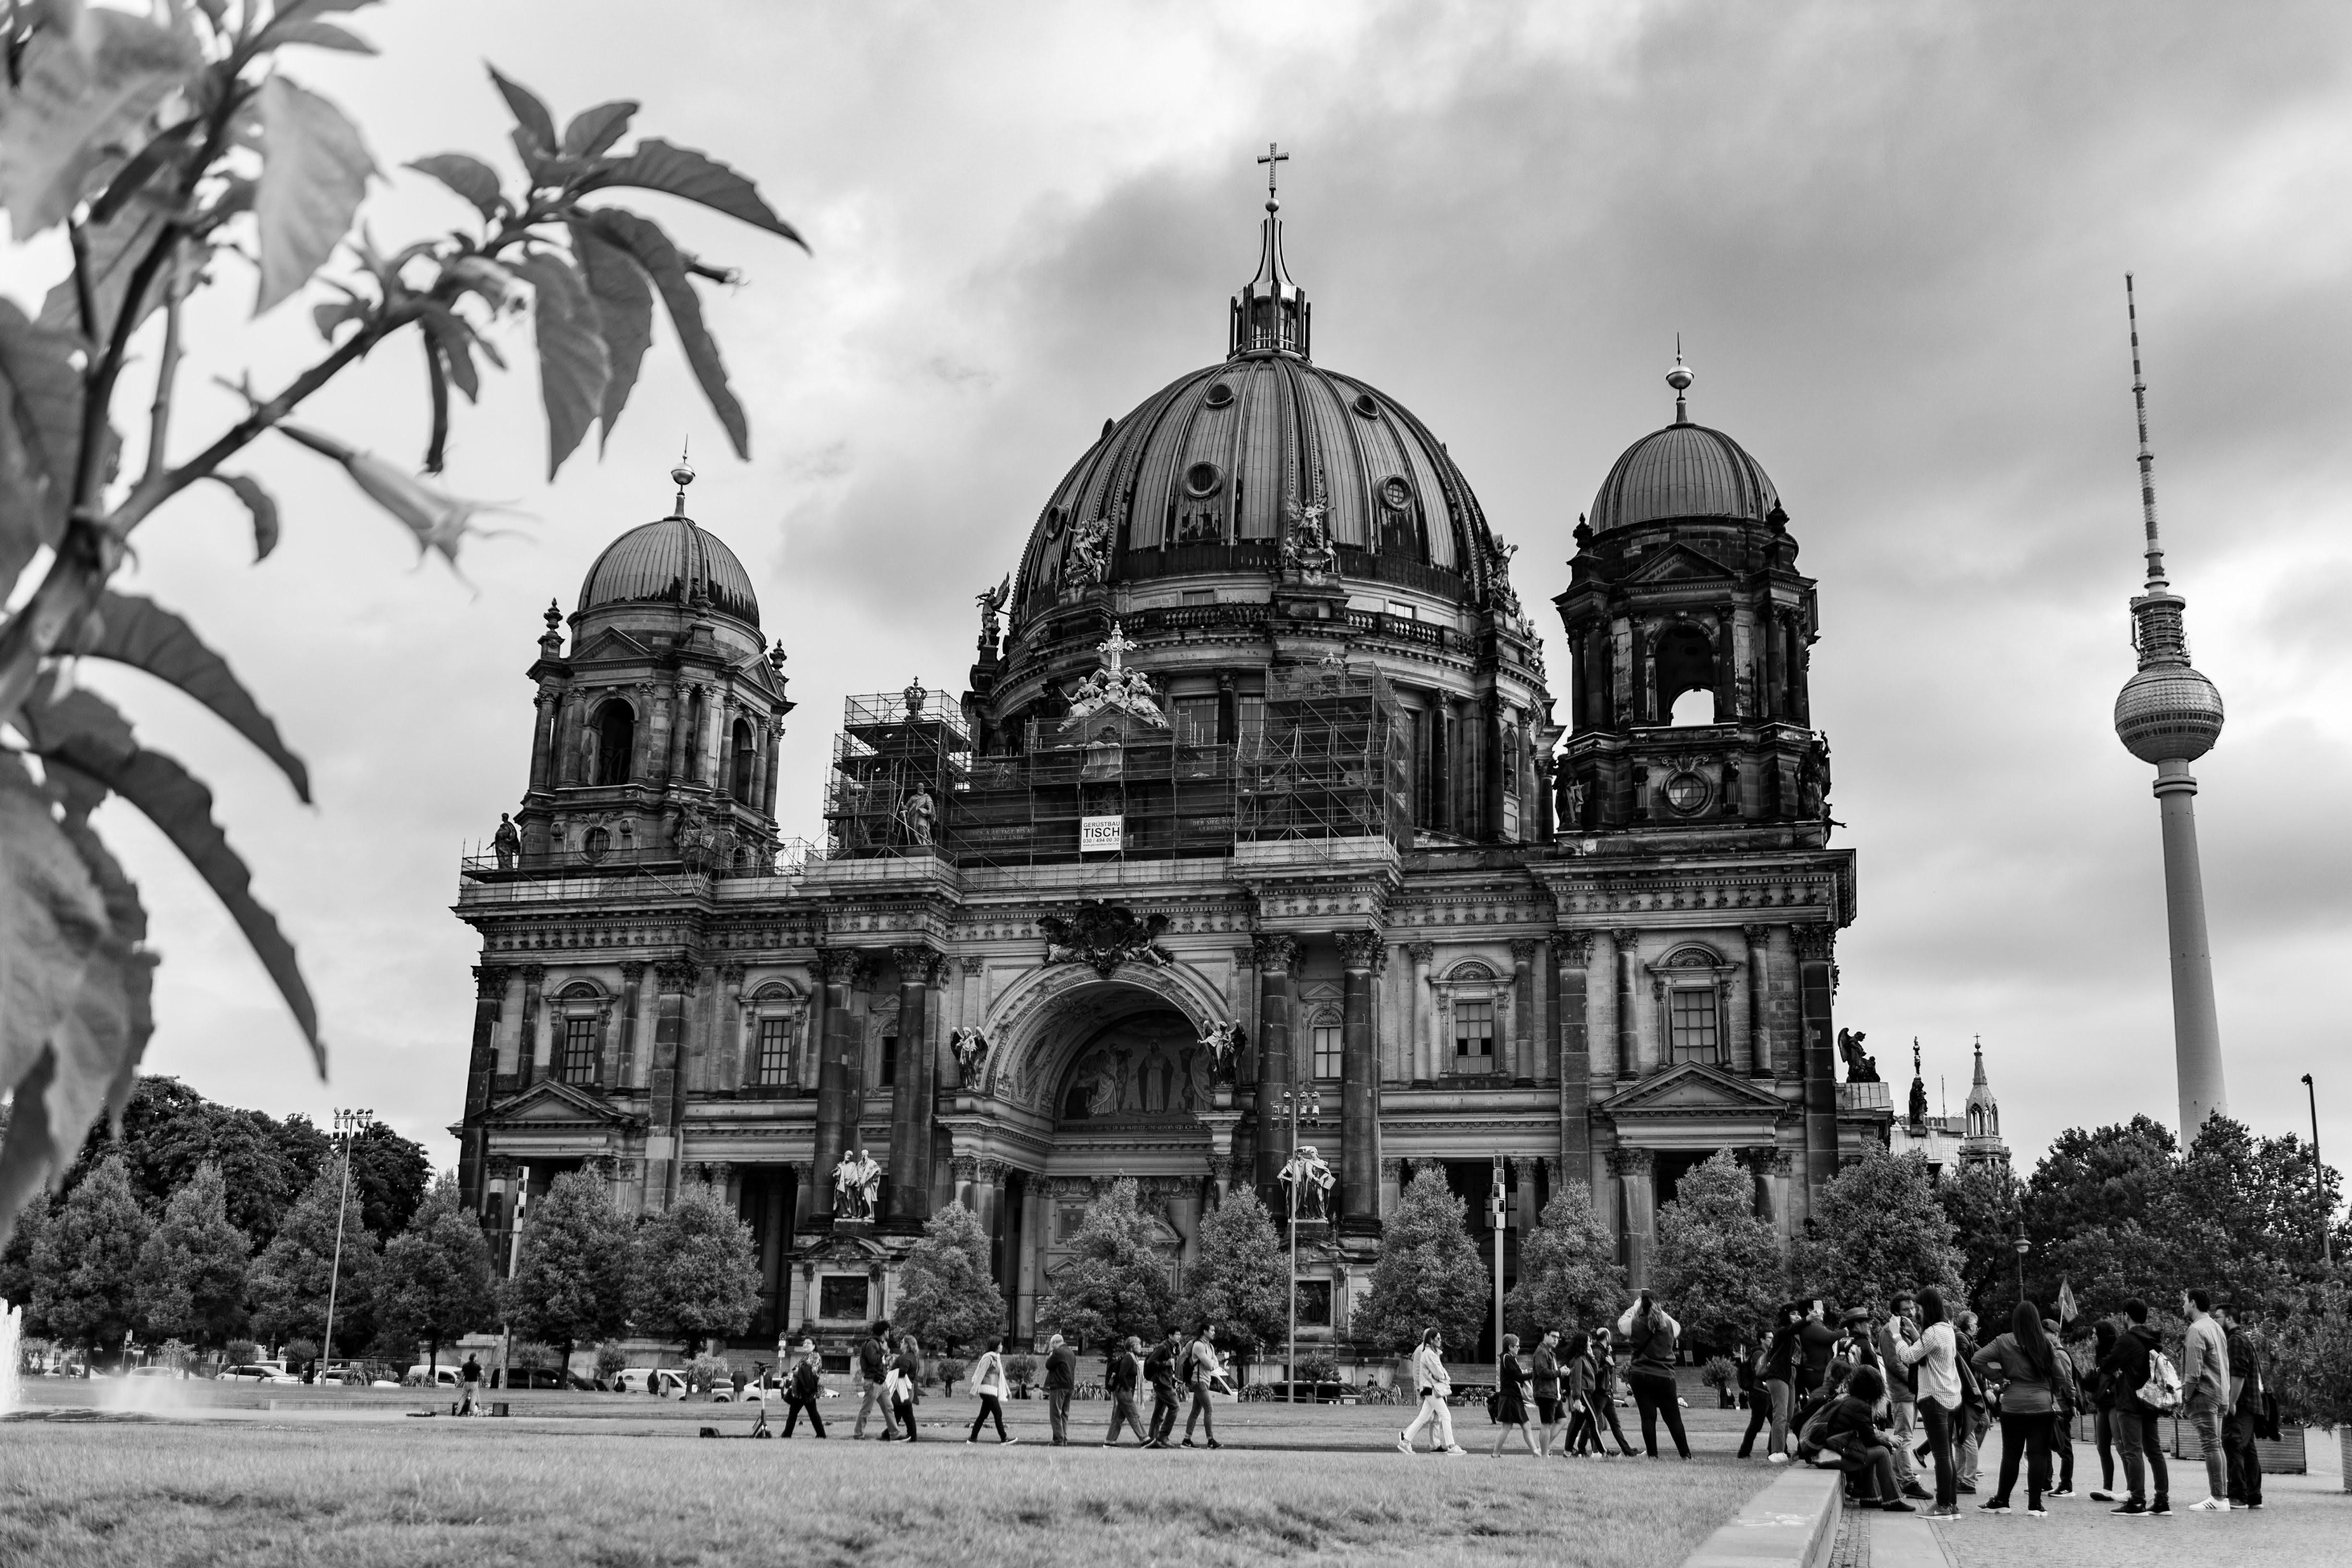 Berlin's Dom